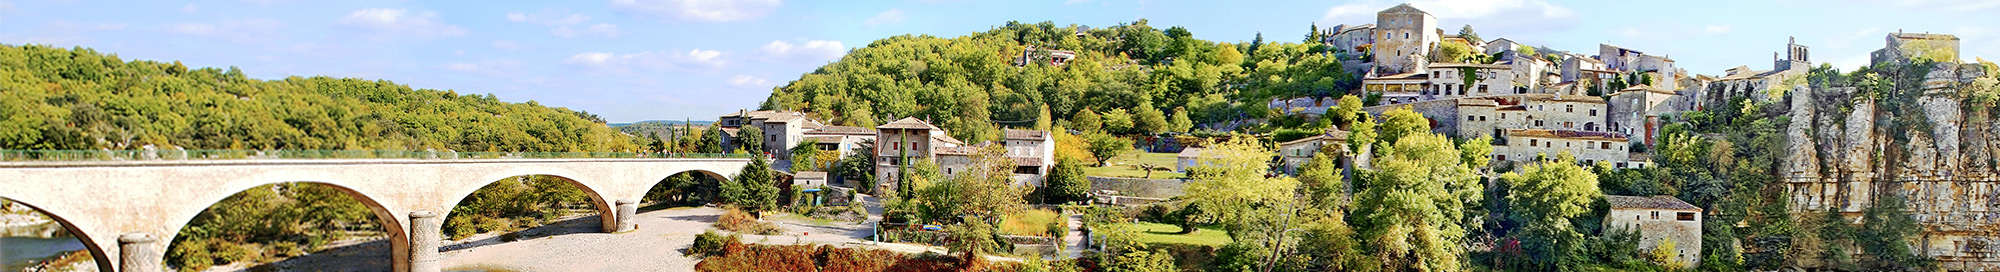 Escapadas fin de semana en Vals-les-Bains